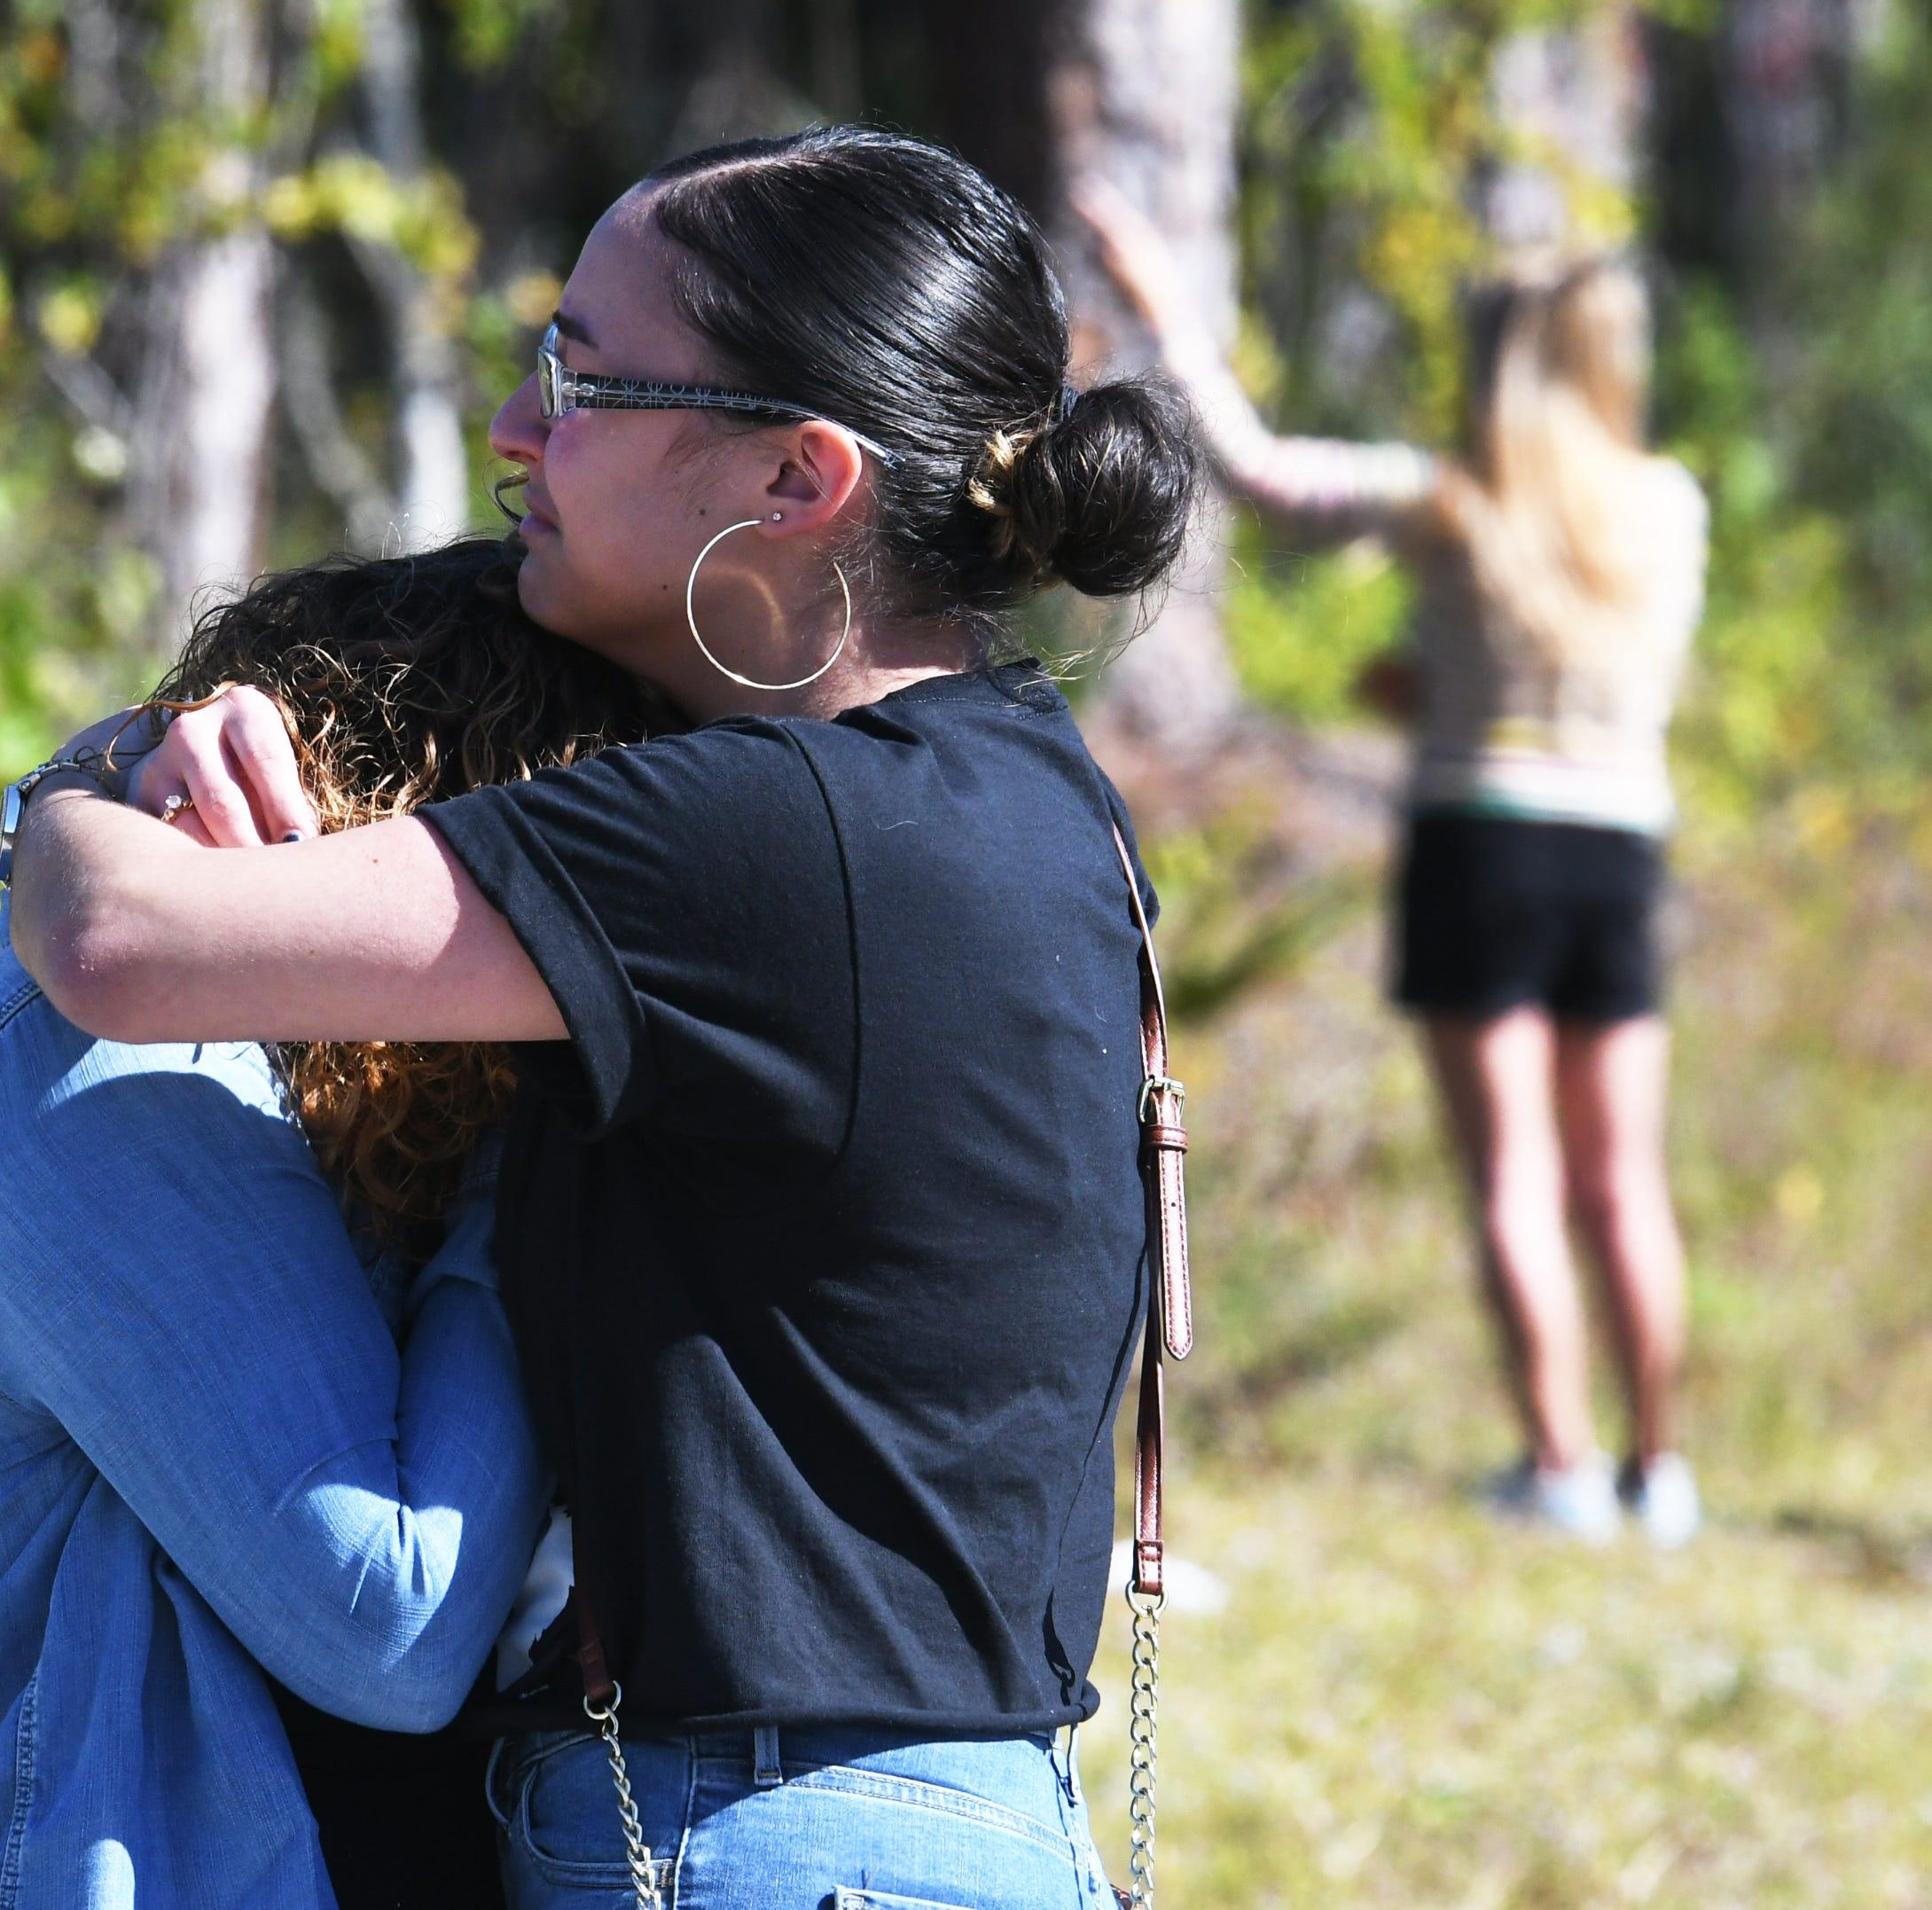 Shooting investigated at Palm Bay condo